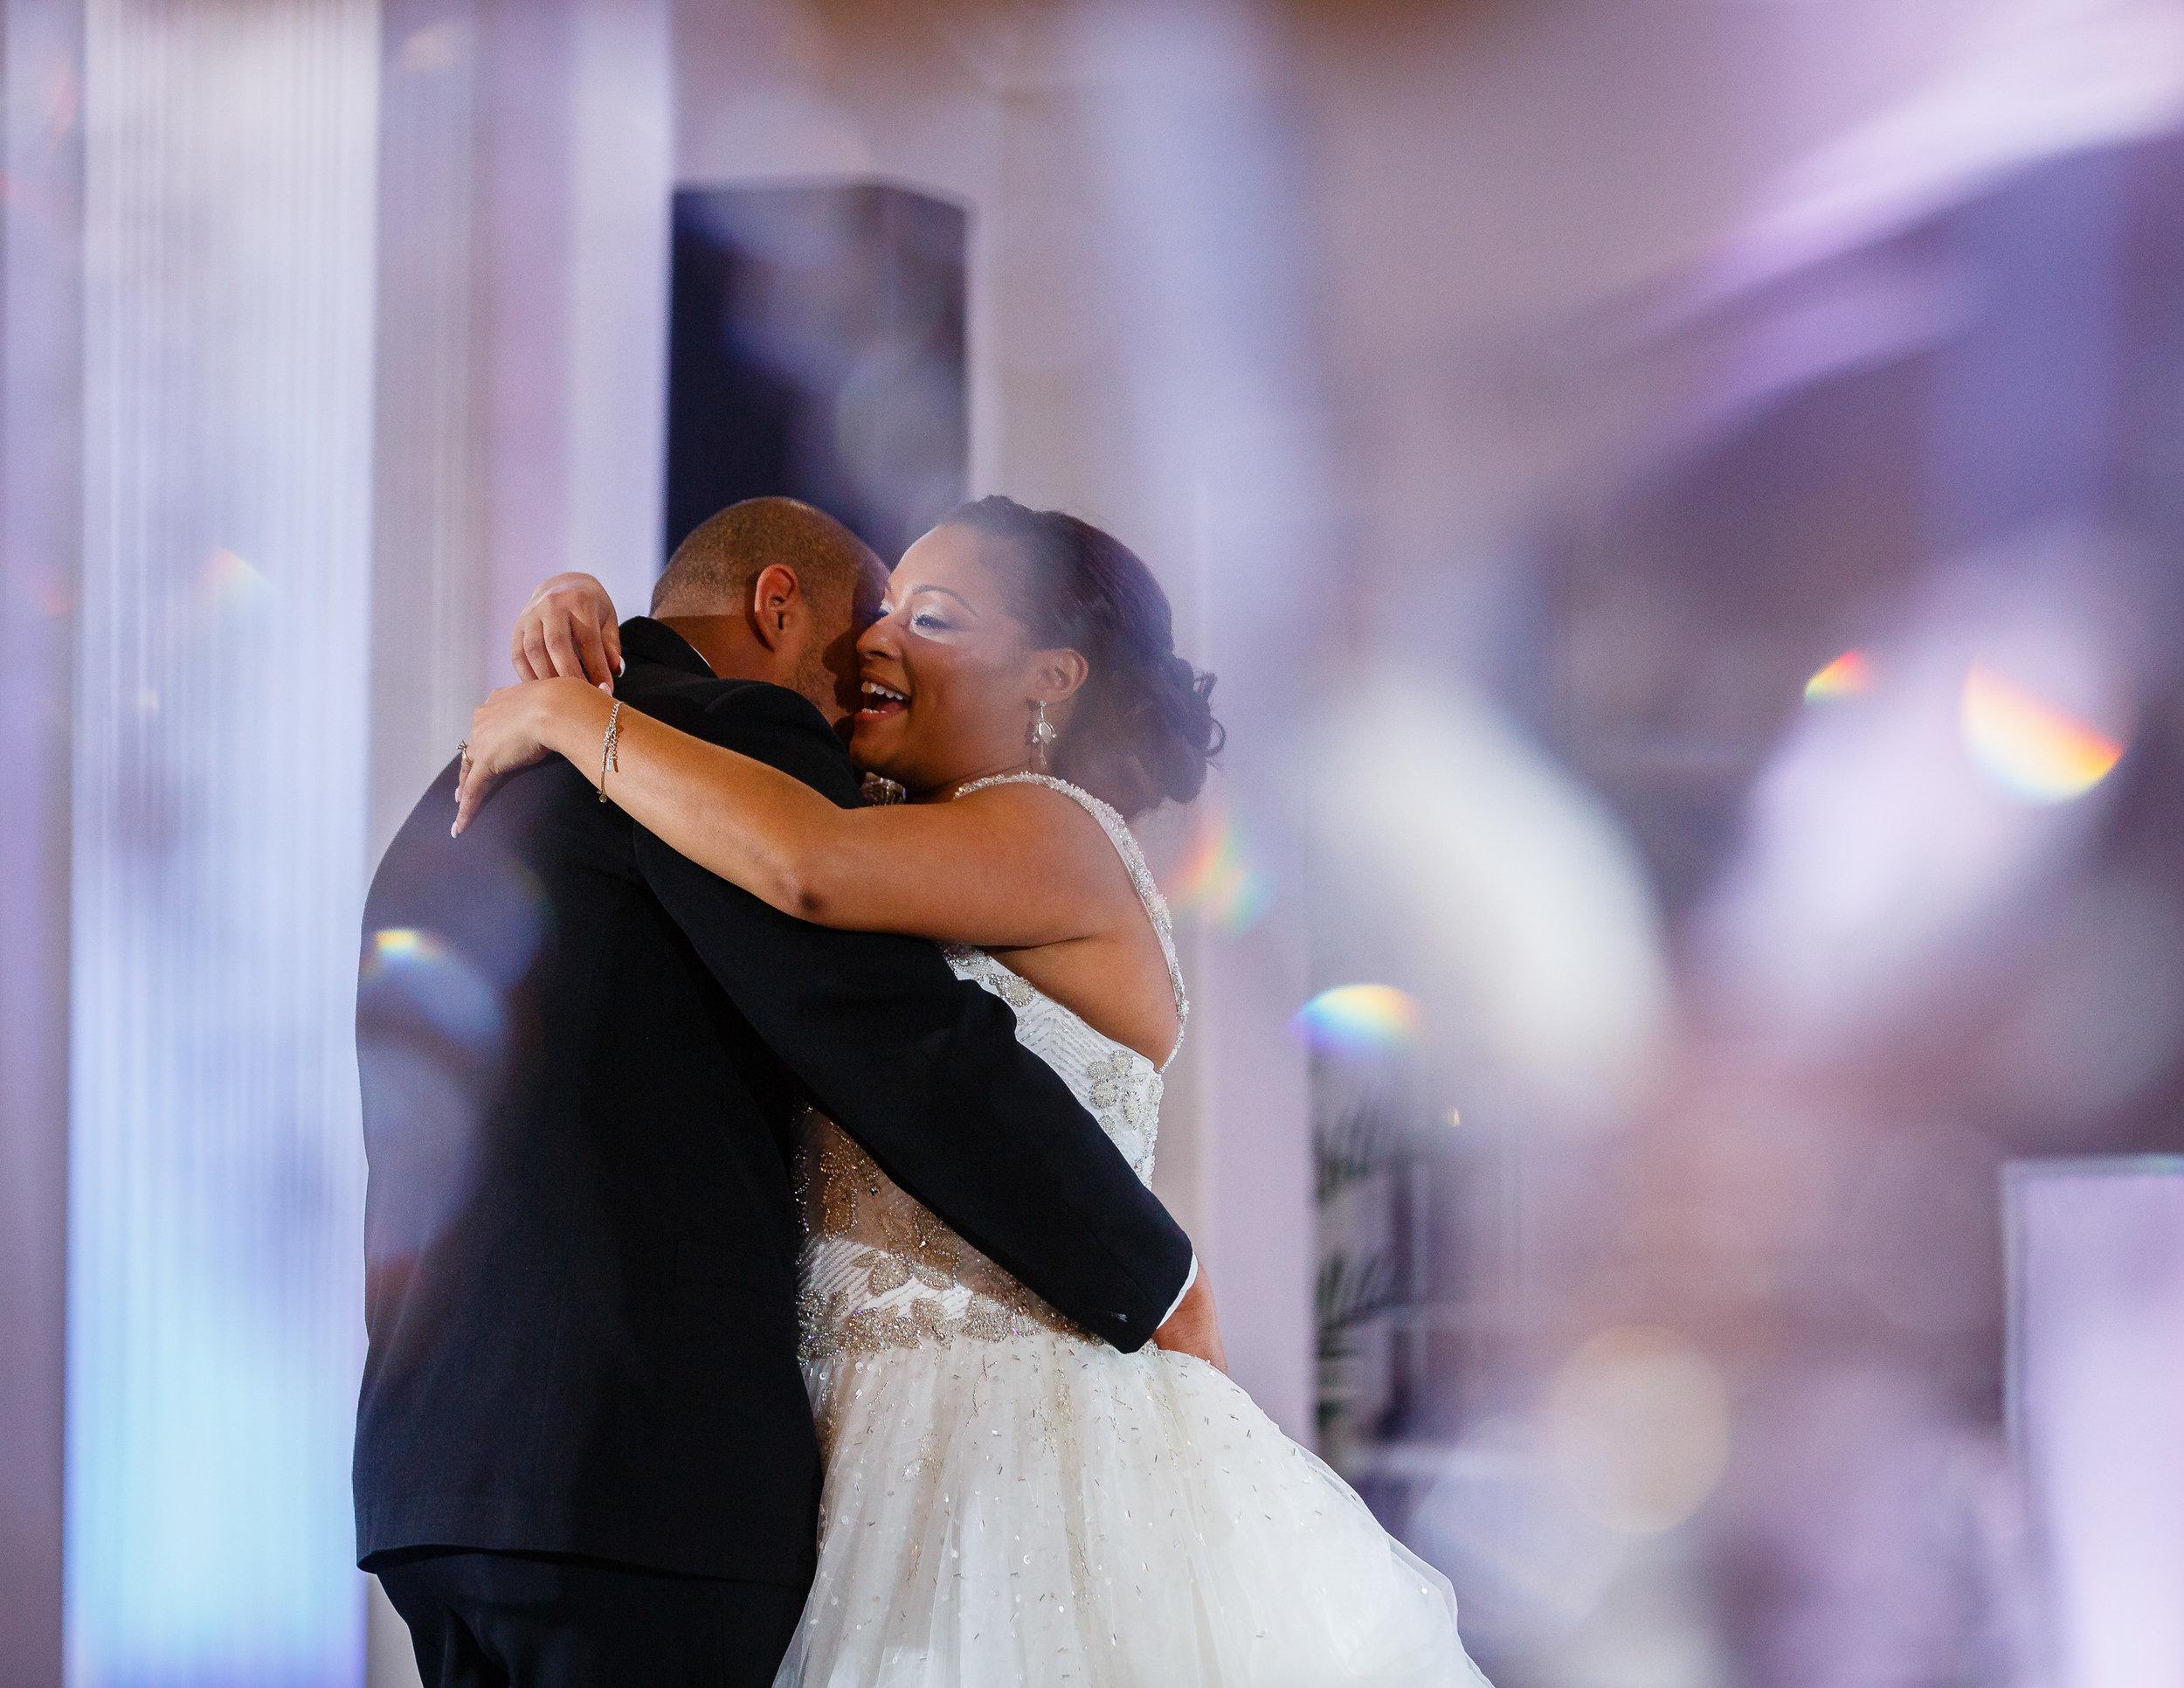 Dallas-wedding-planner-swank-soiree-fort-worth-weddingTLWed1217-642.jpg